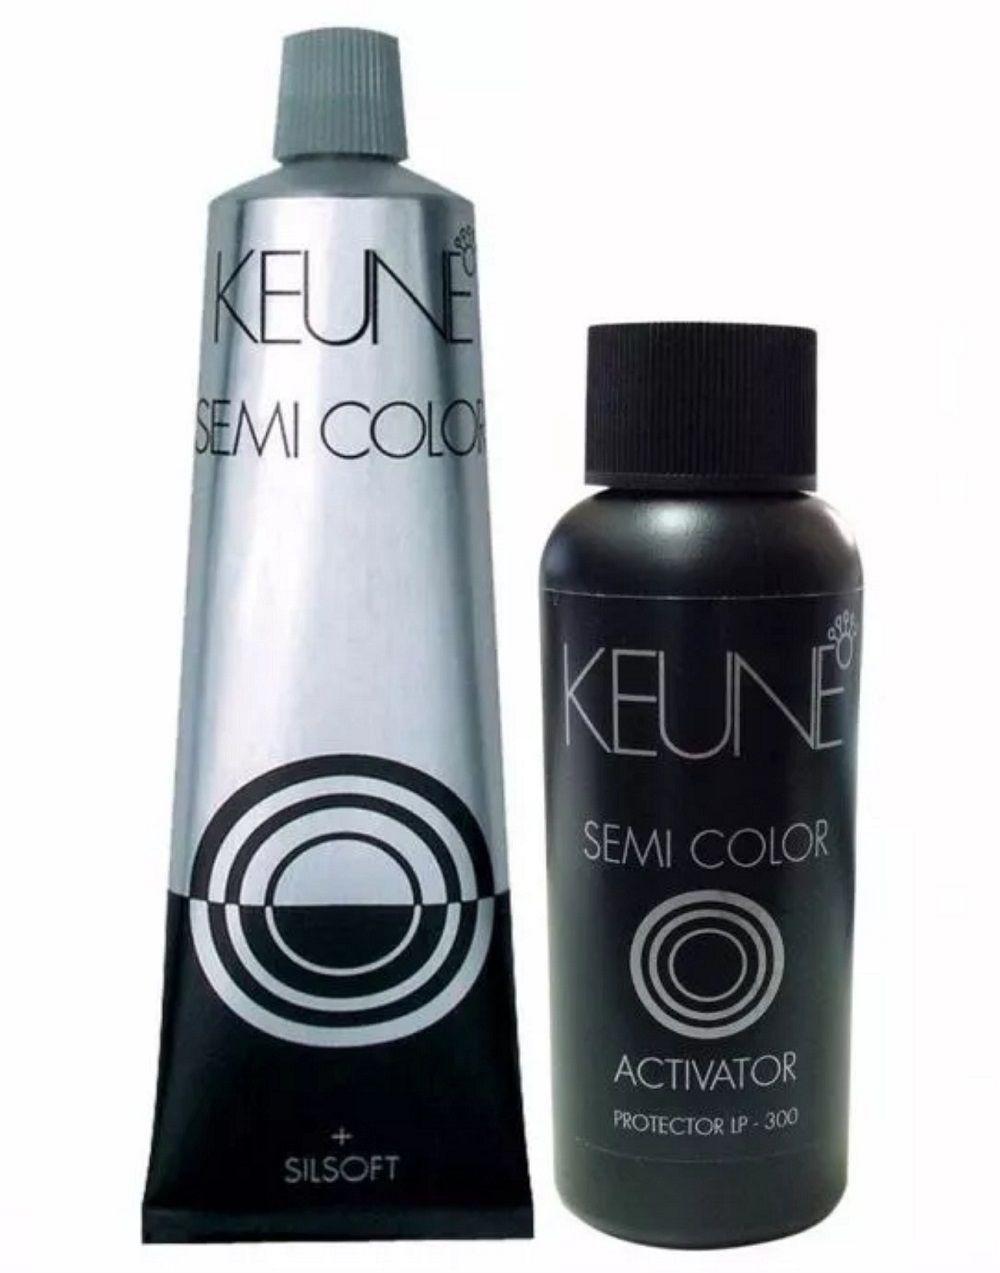 Kit Keune Semi Color 60ml - Cor 1 - Preto + Ativador 60ml